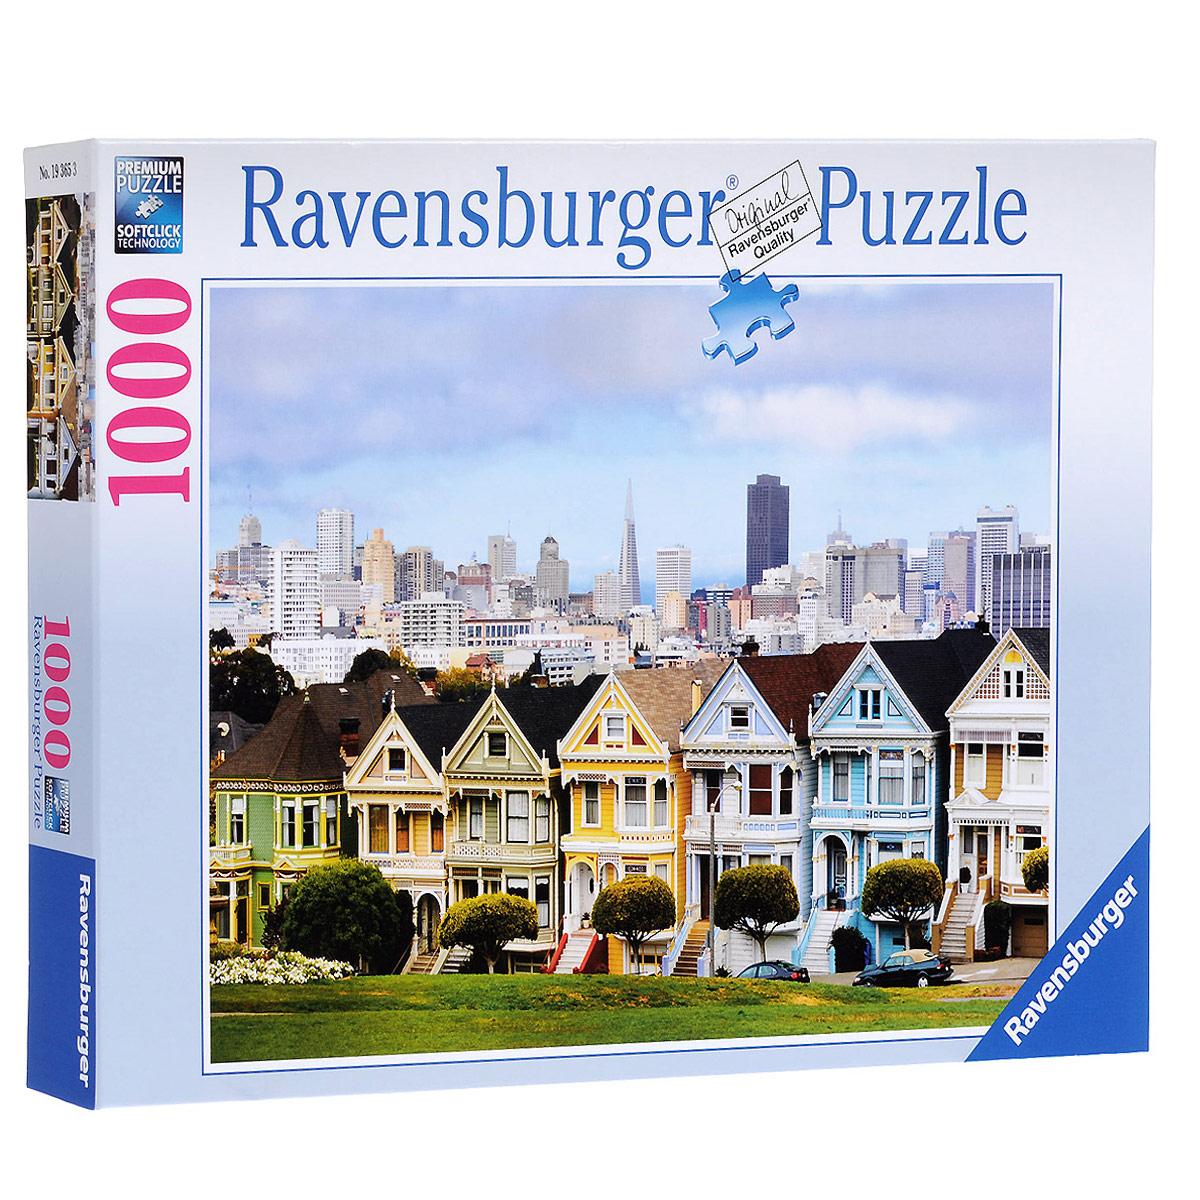 Ravensburger Викторианские дома Сан-Франциско. Пазл, 1000 элементов